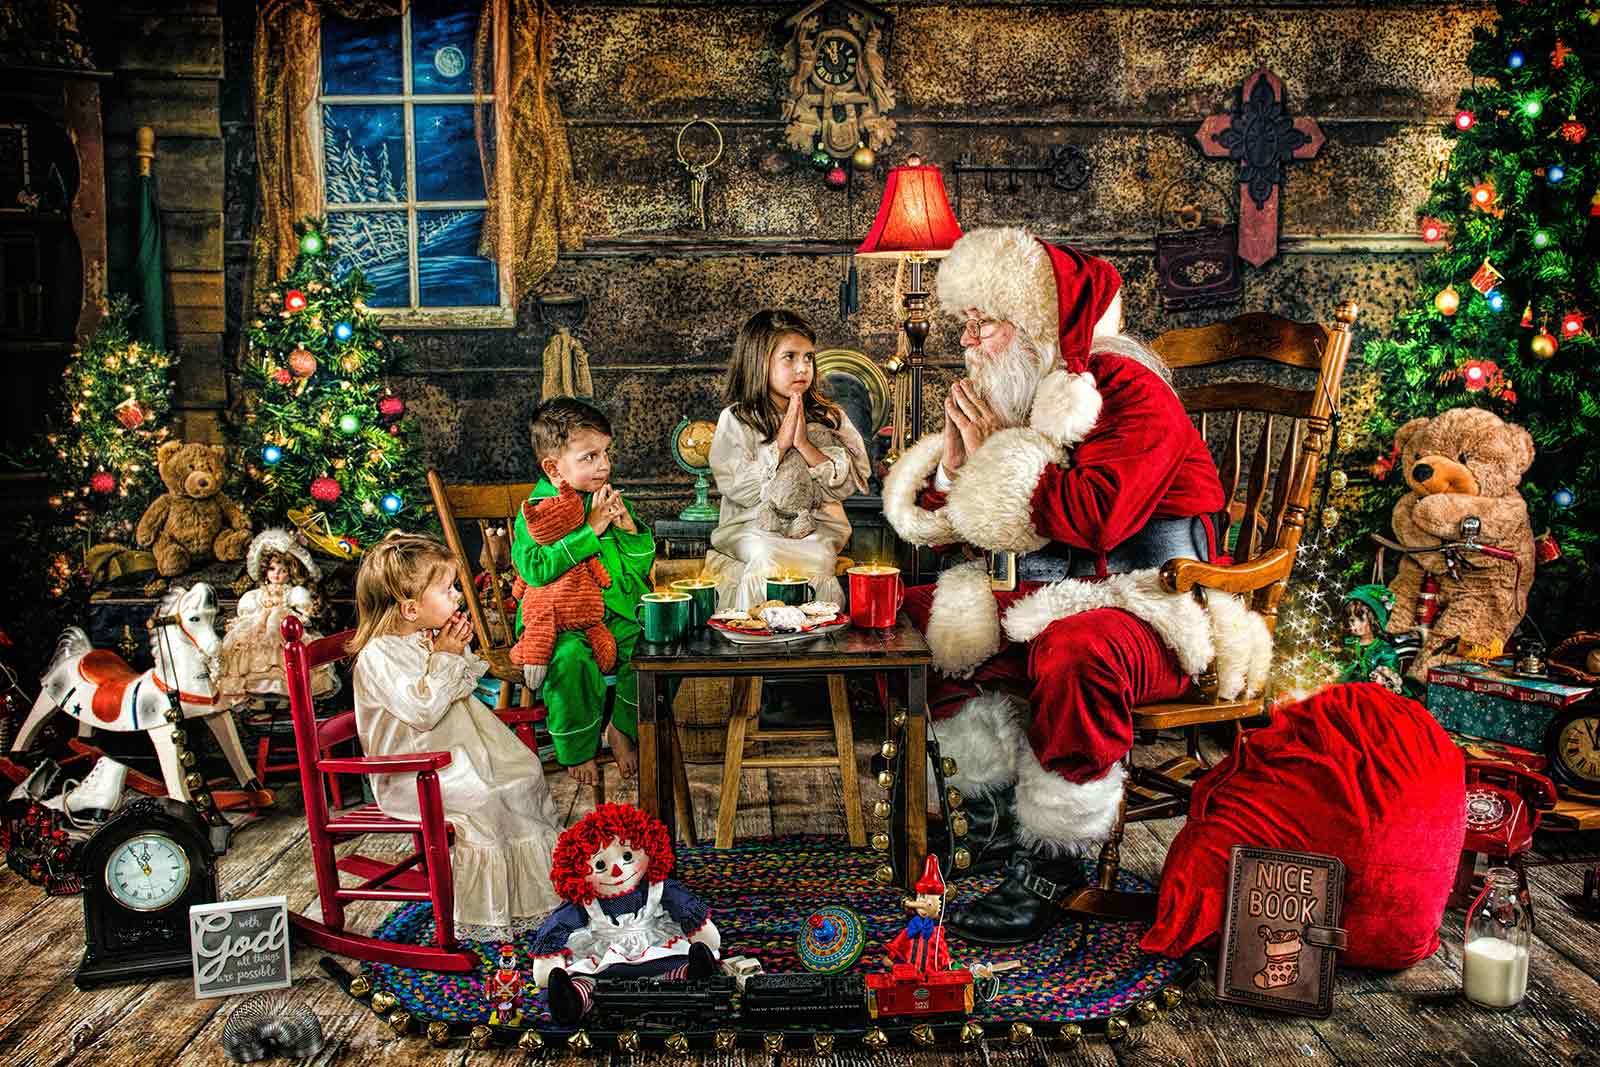 004_Magic-of-Santa-Anna-Thielen-Photography